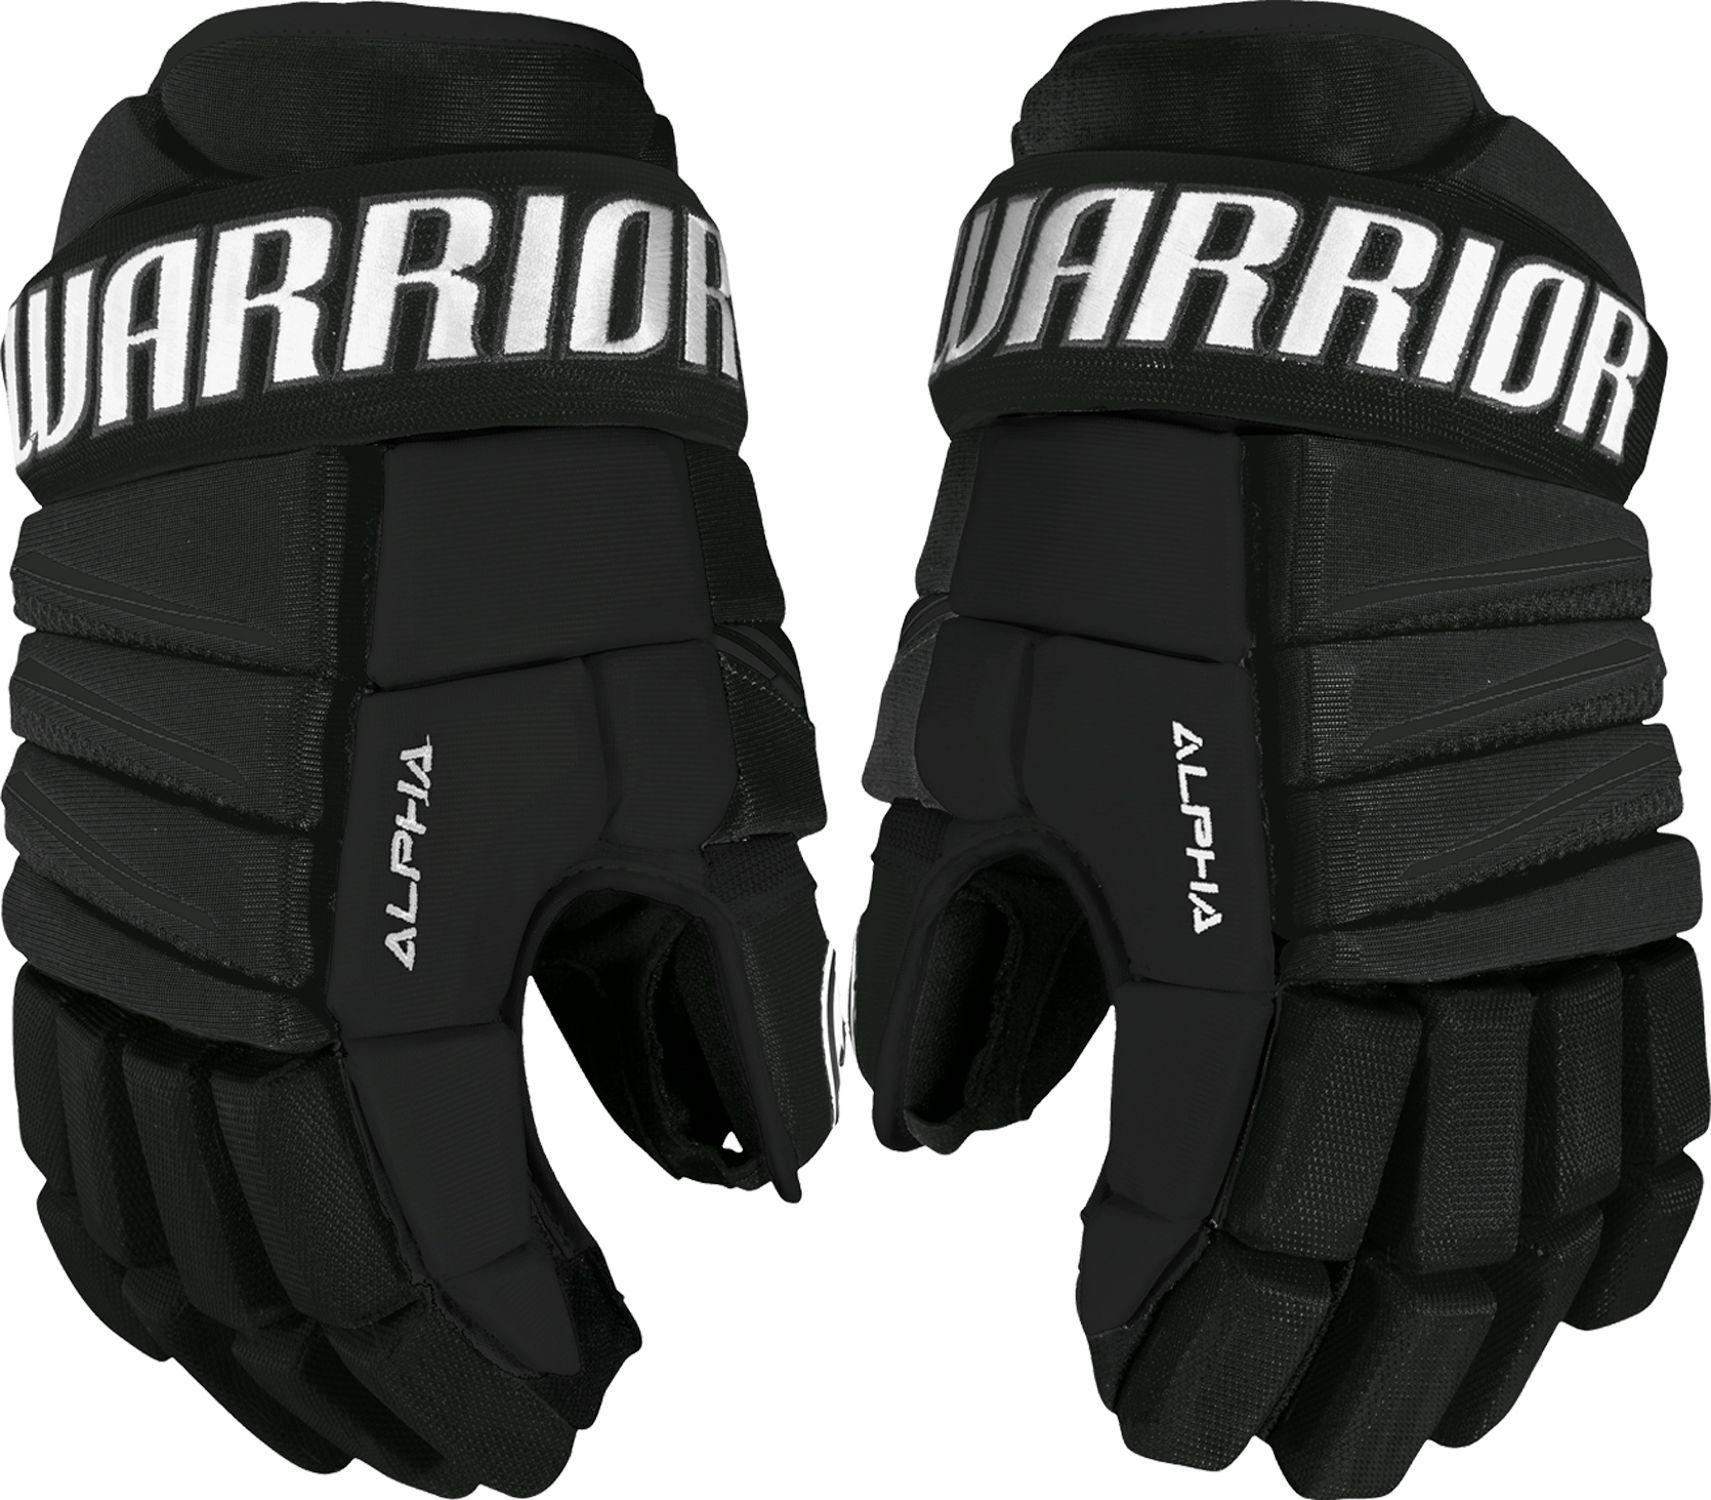 Warrior Senior Alpha Qx3 Ice Hockey Gloves Black